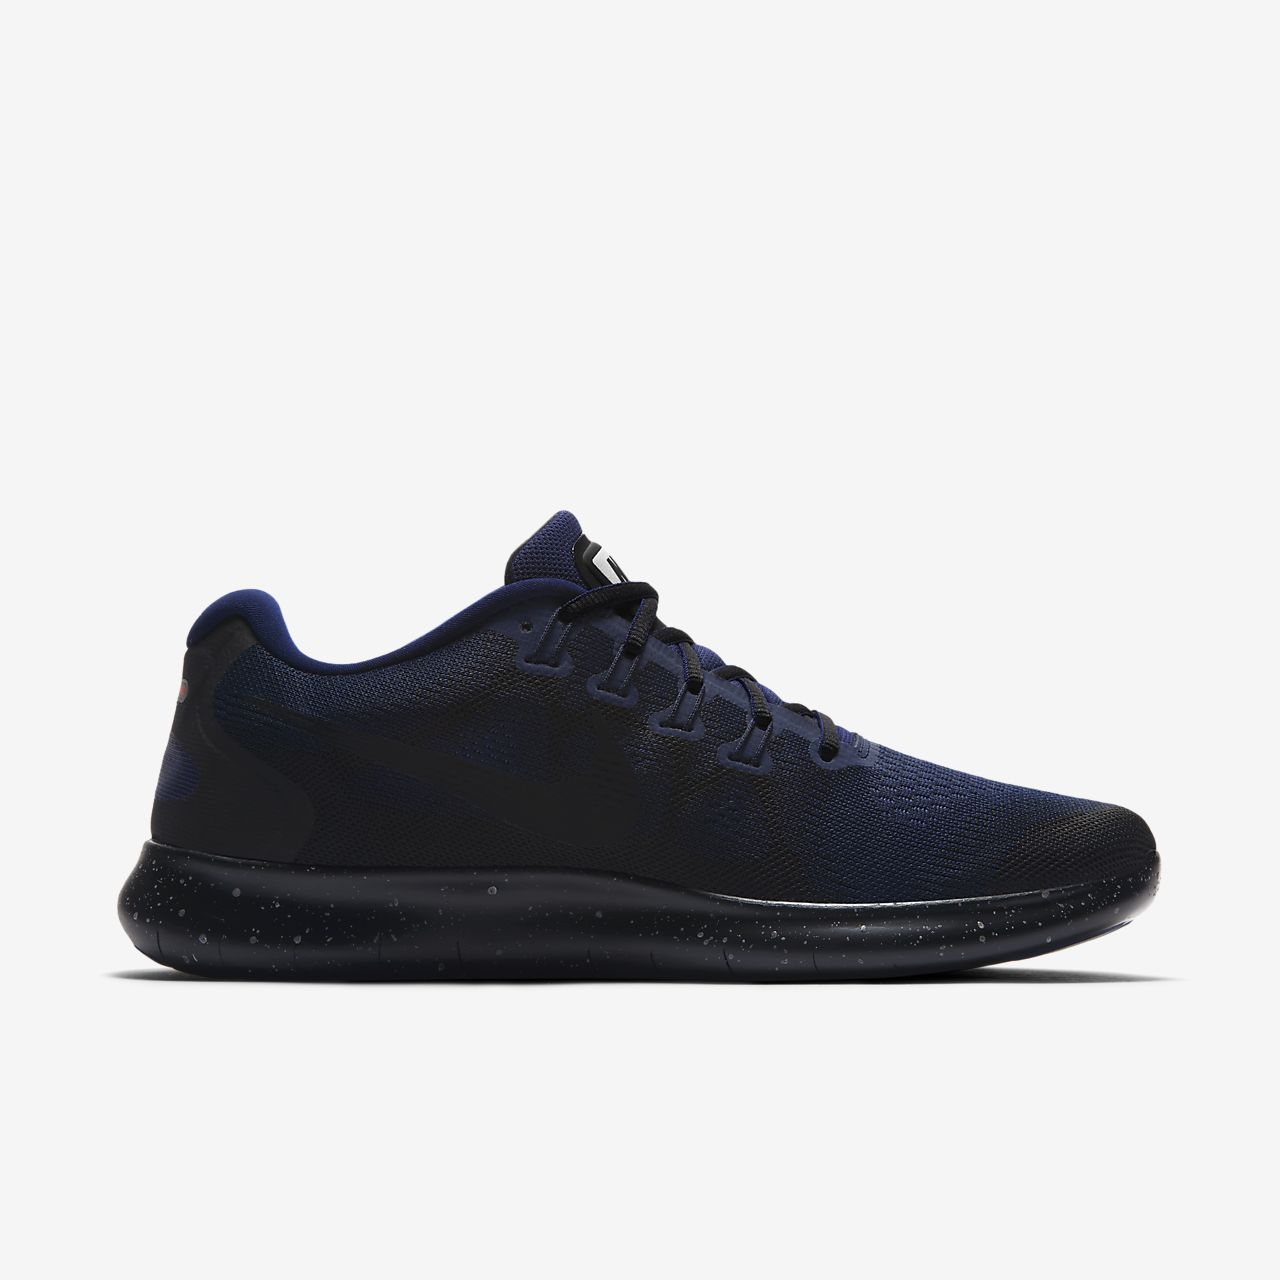 new style 3ce19 58338 Nike Free RN 2017 Shield Men s Running Shoe